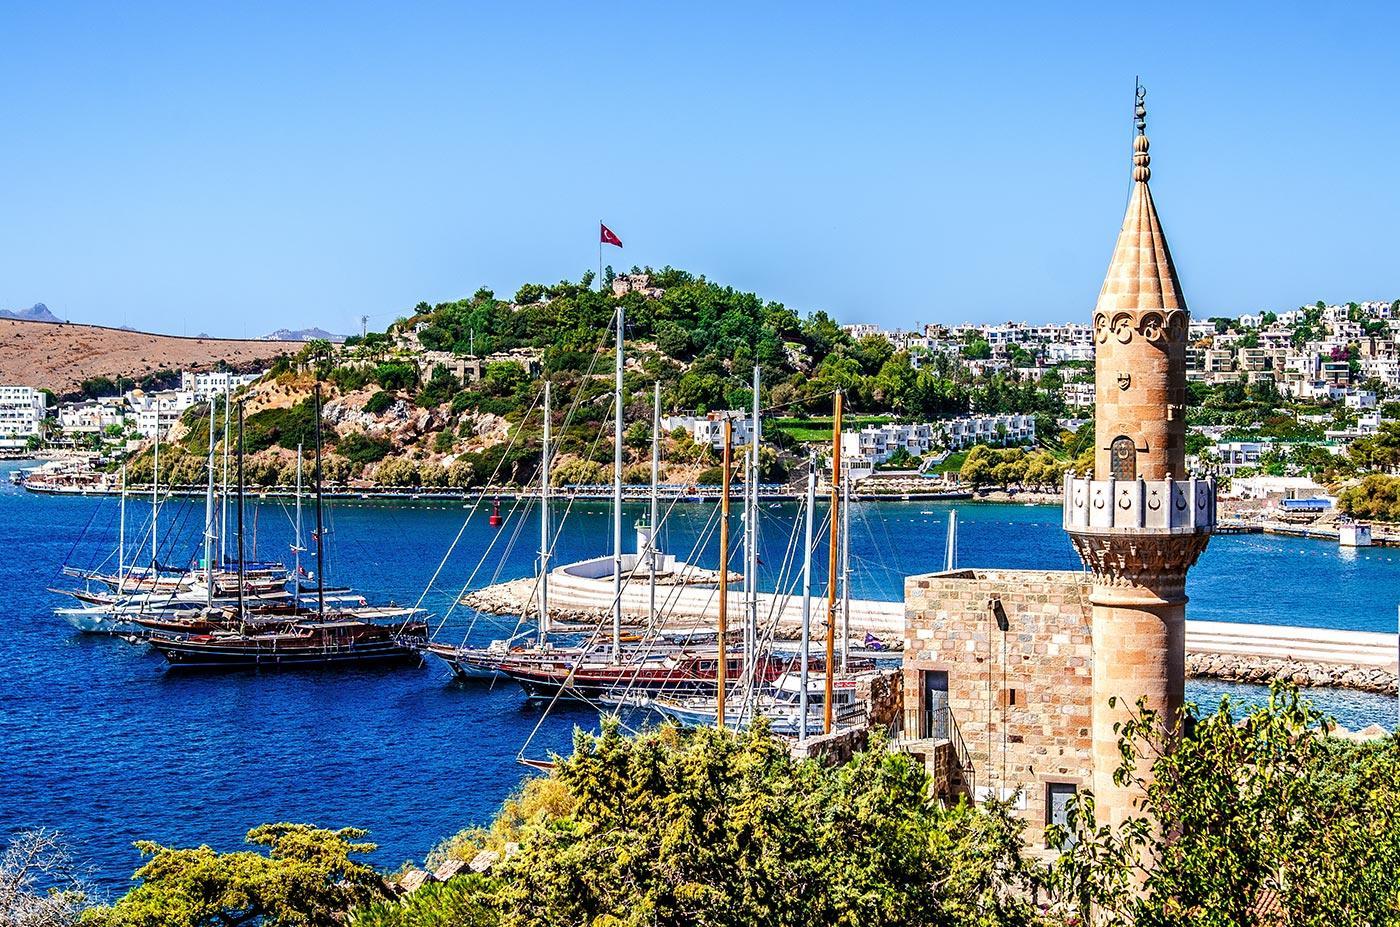 Sailing in Turkey